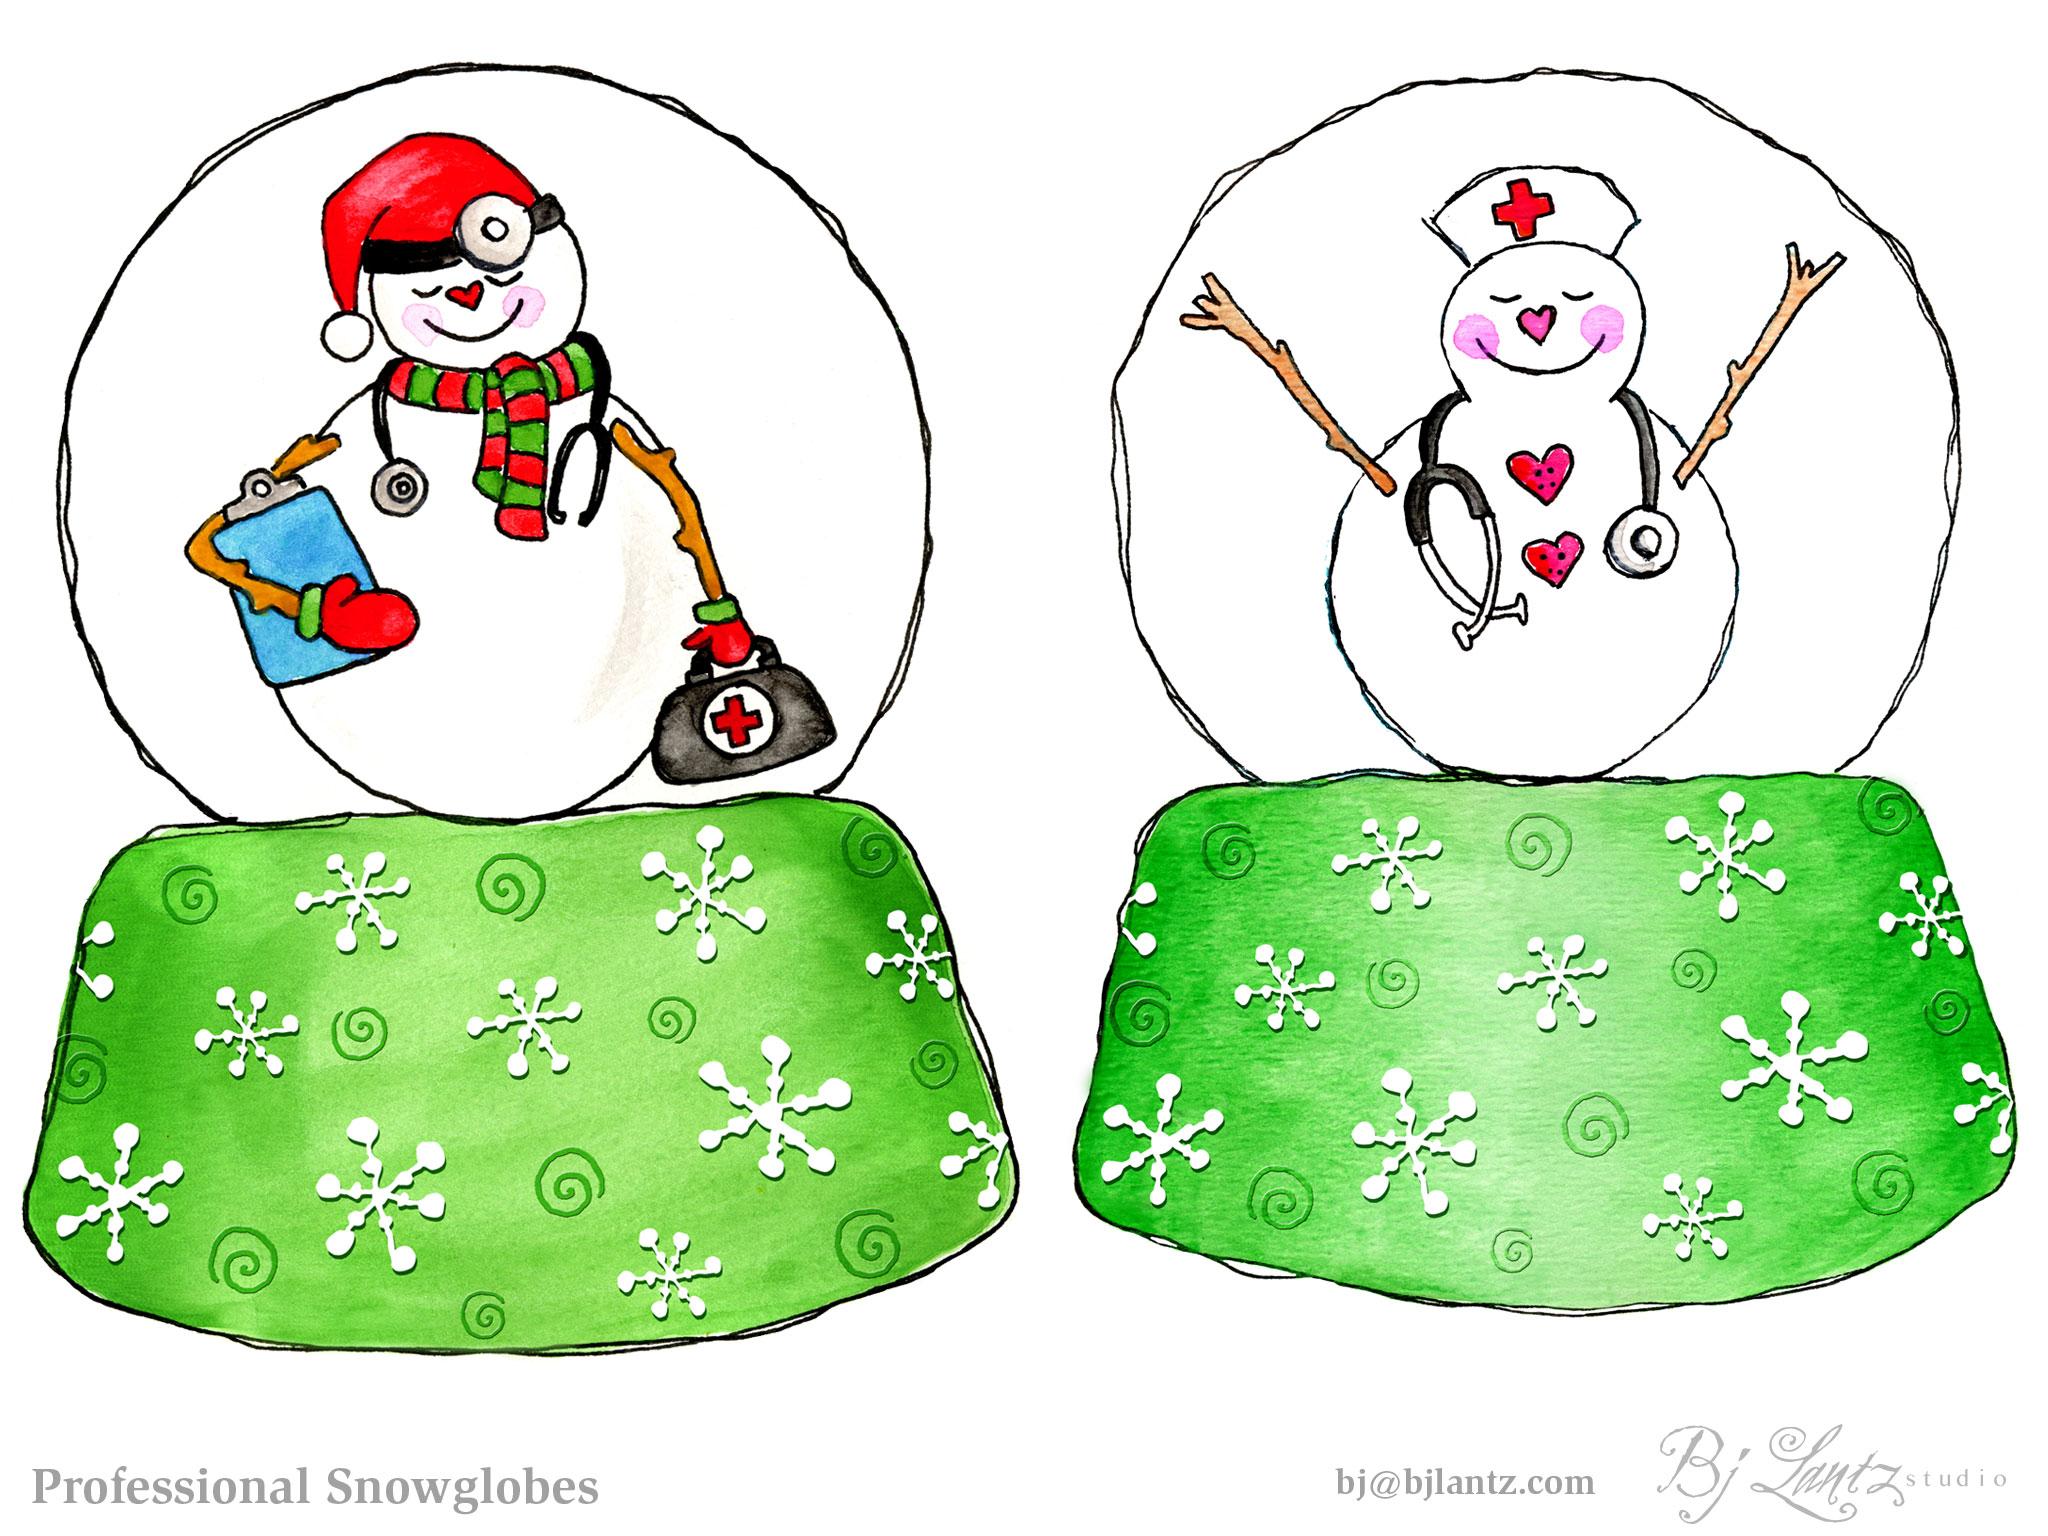 Snowglobes_pros_portfolio_1.jpg